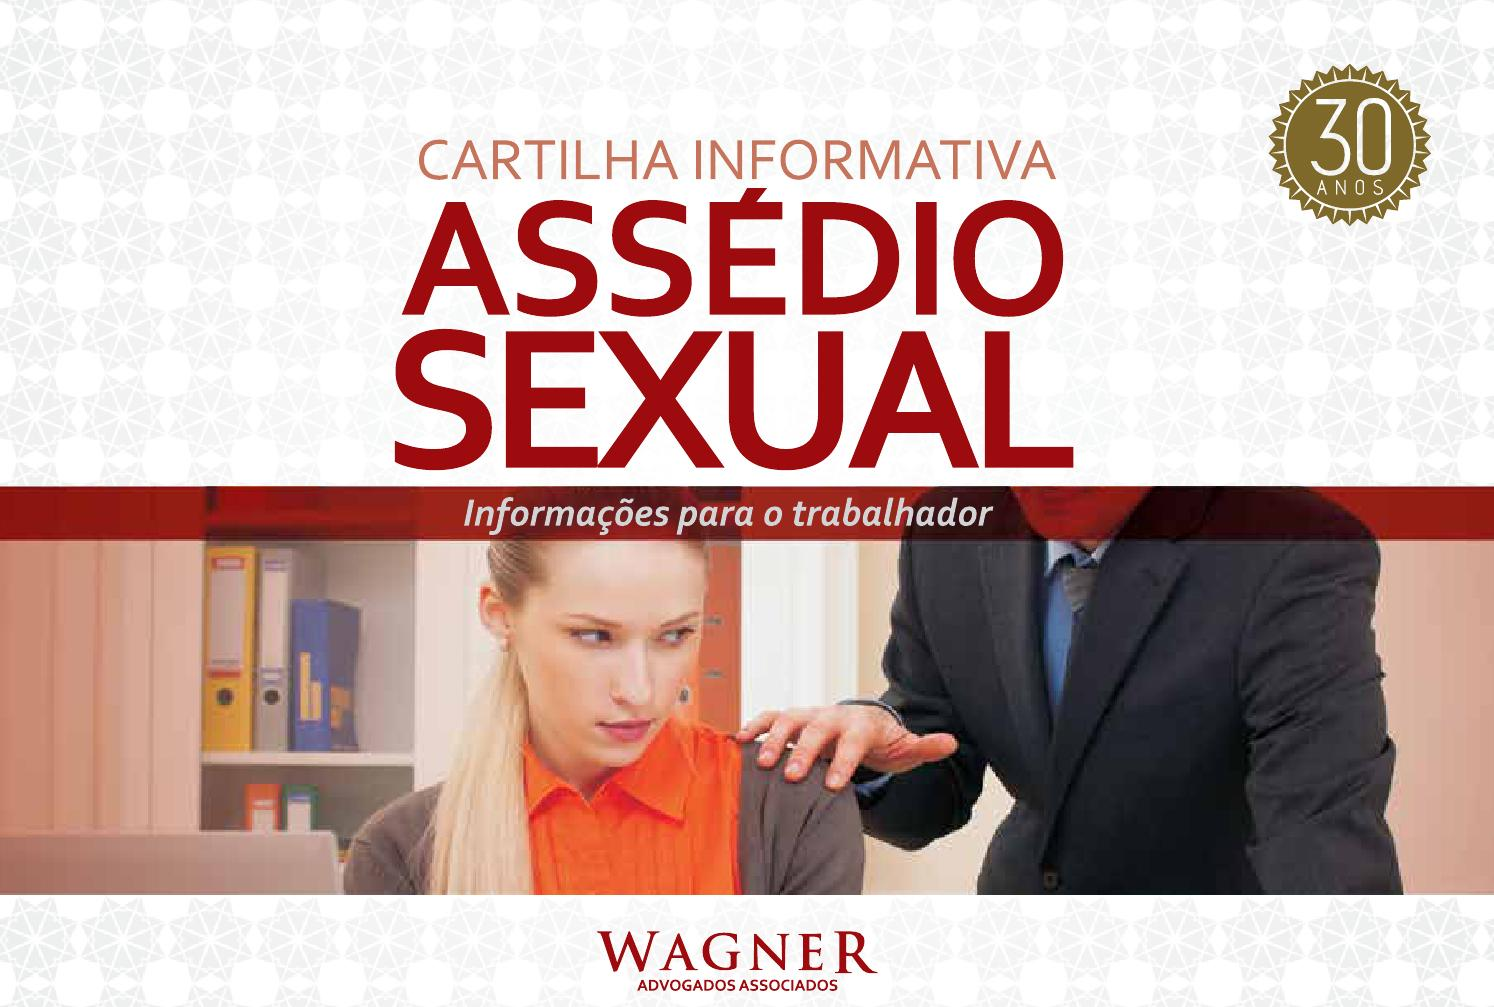 Cartilha Assédio Sexual by Comunicacao - issuu f201a7ef1a